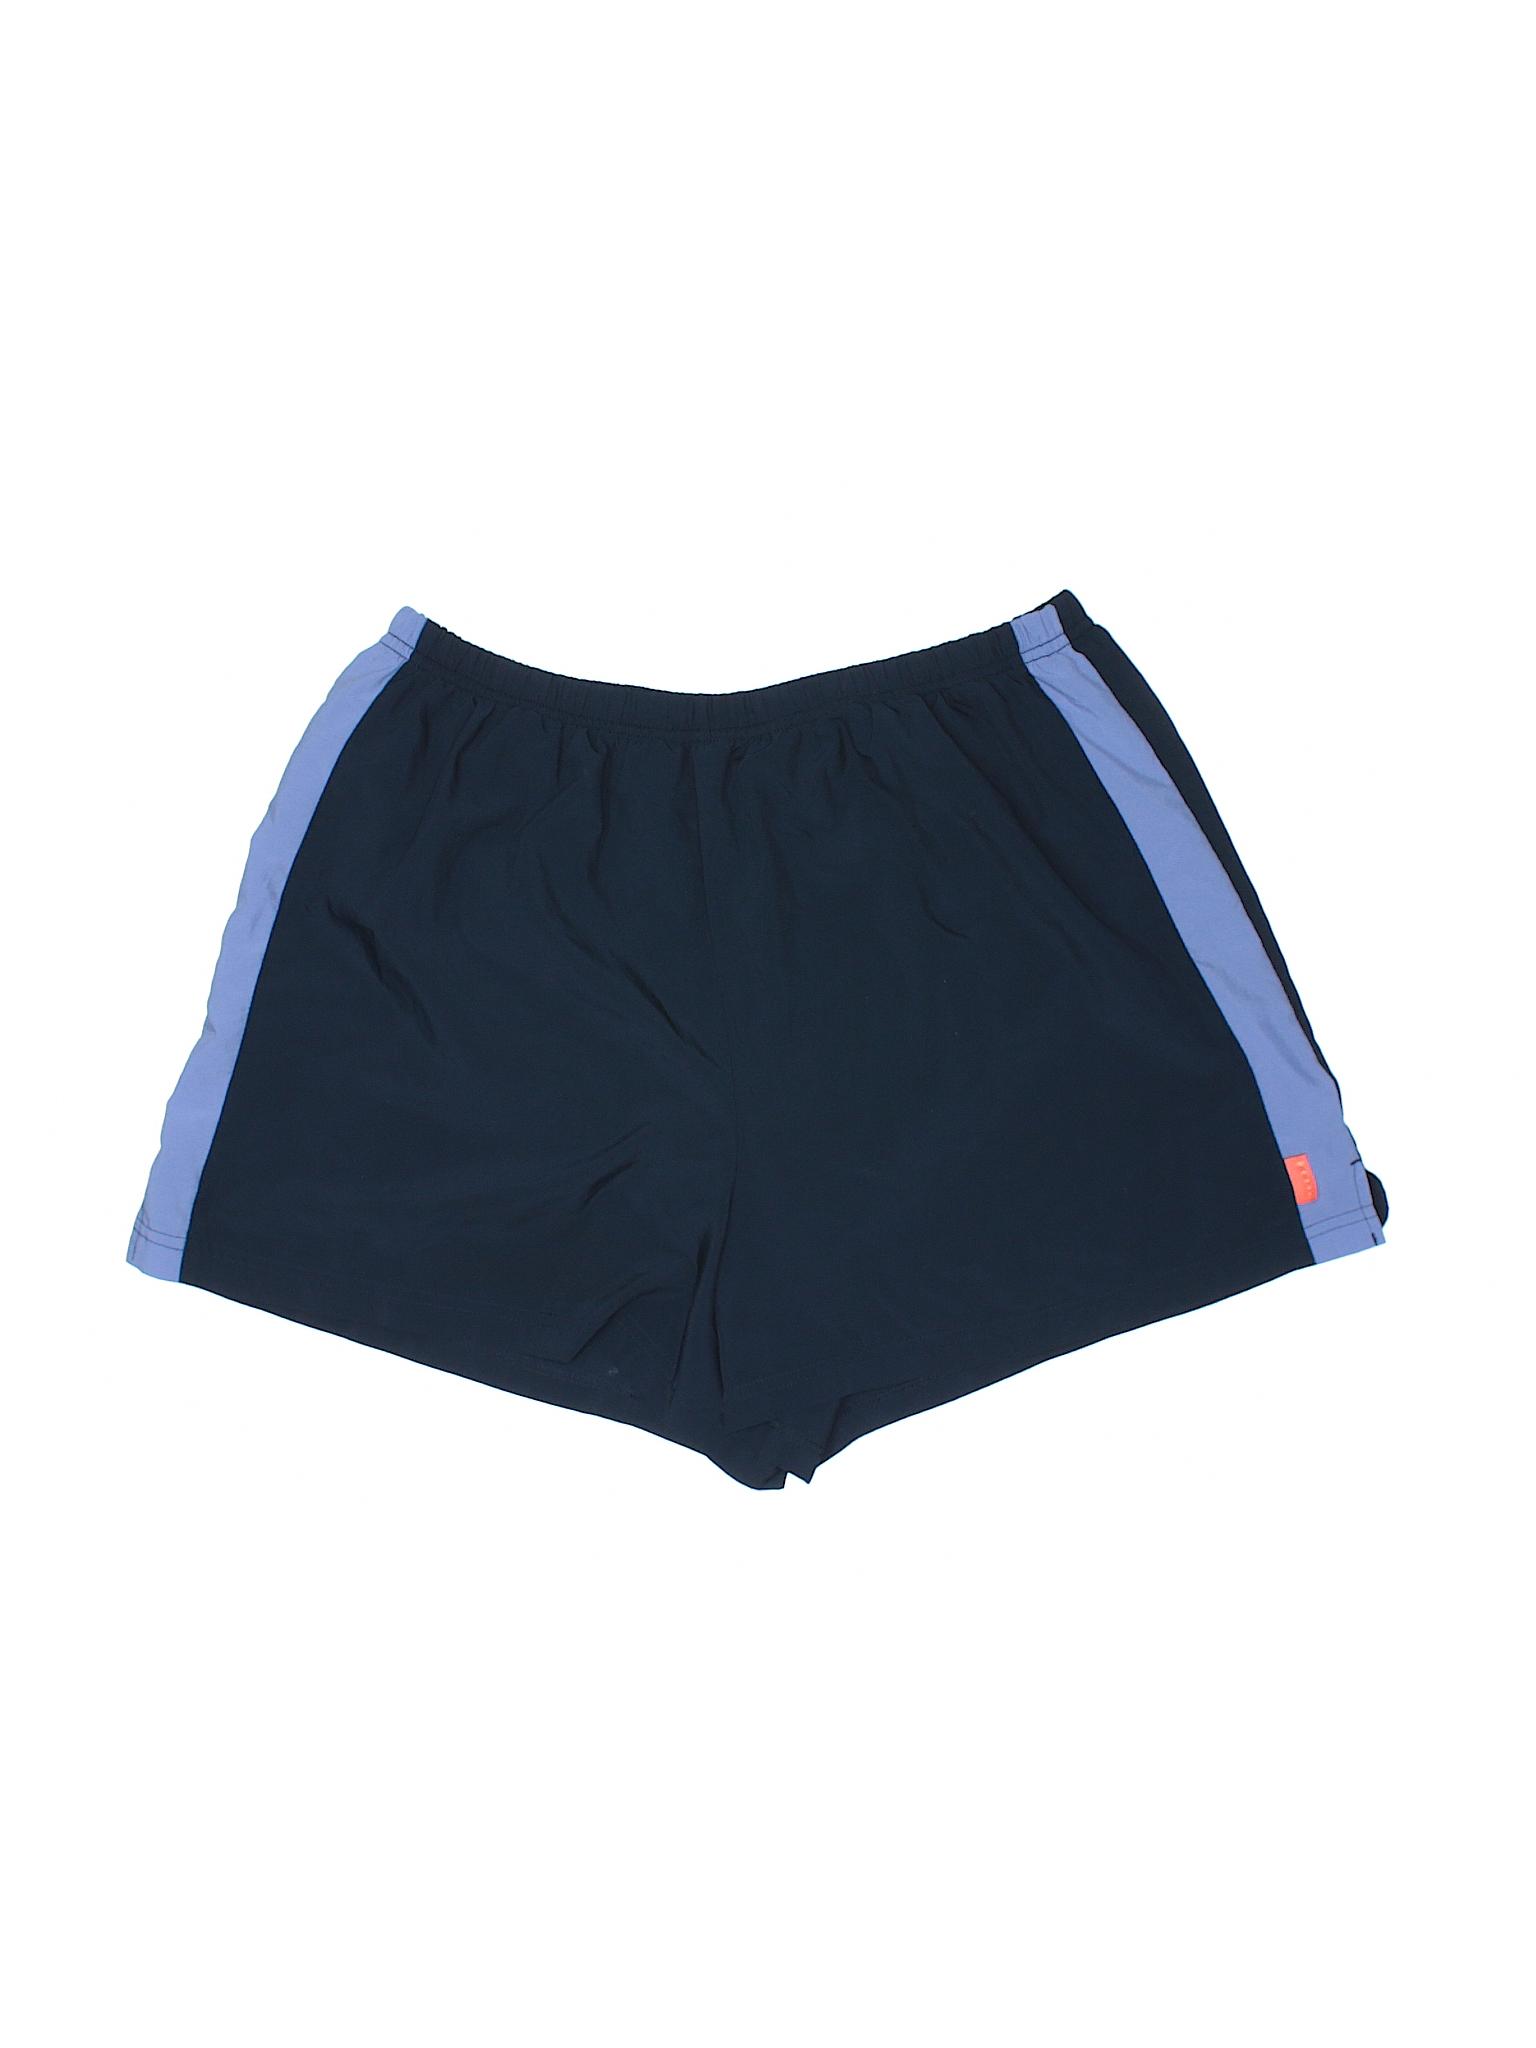 Athletic Boutique Boutique Shorts leisure leisure ProSpirit RqwIC